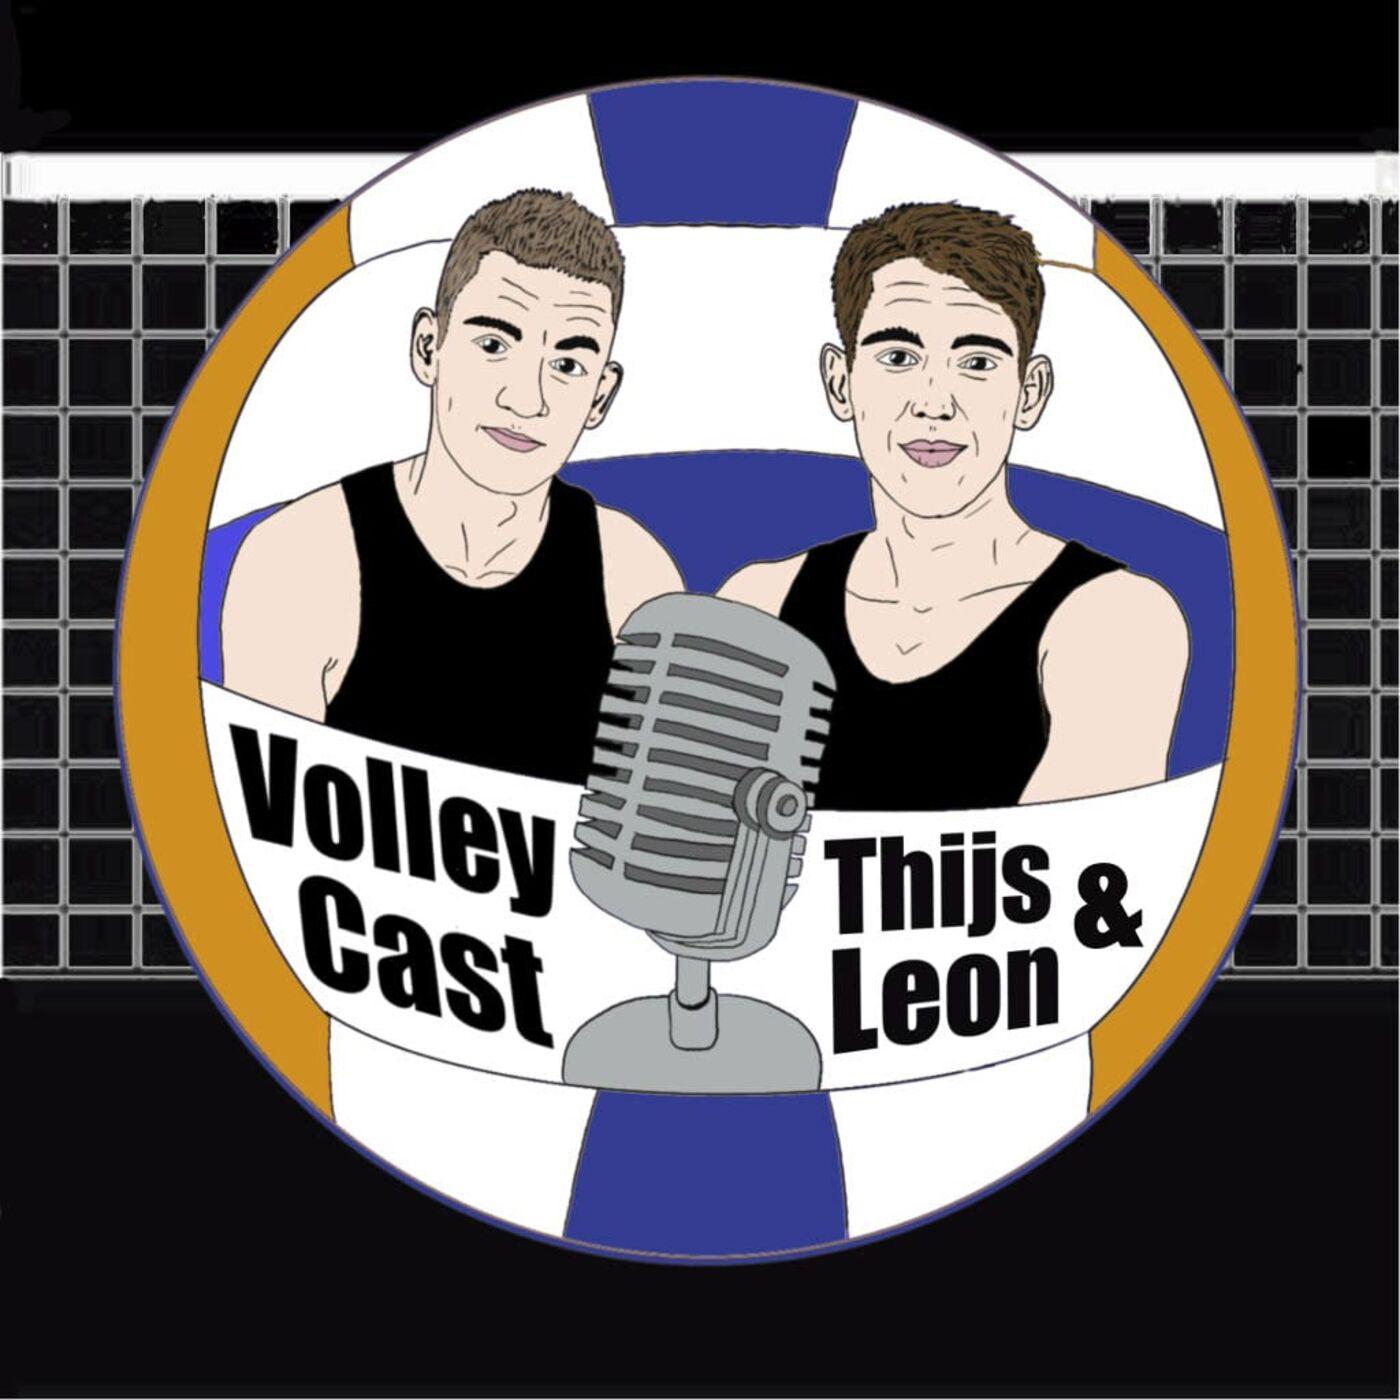 VolleycastNL logo